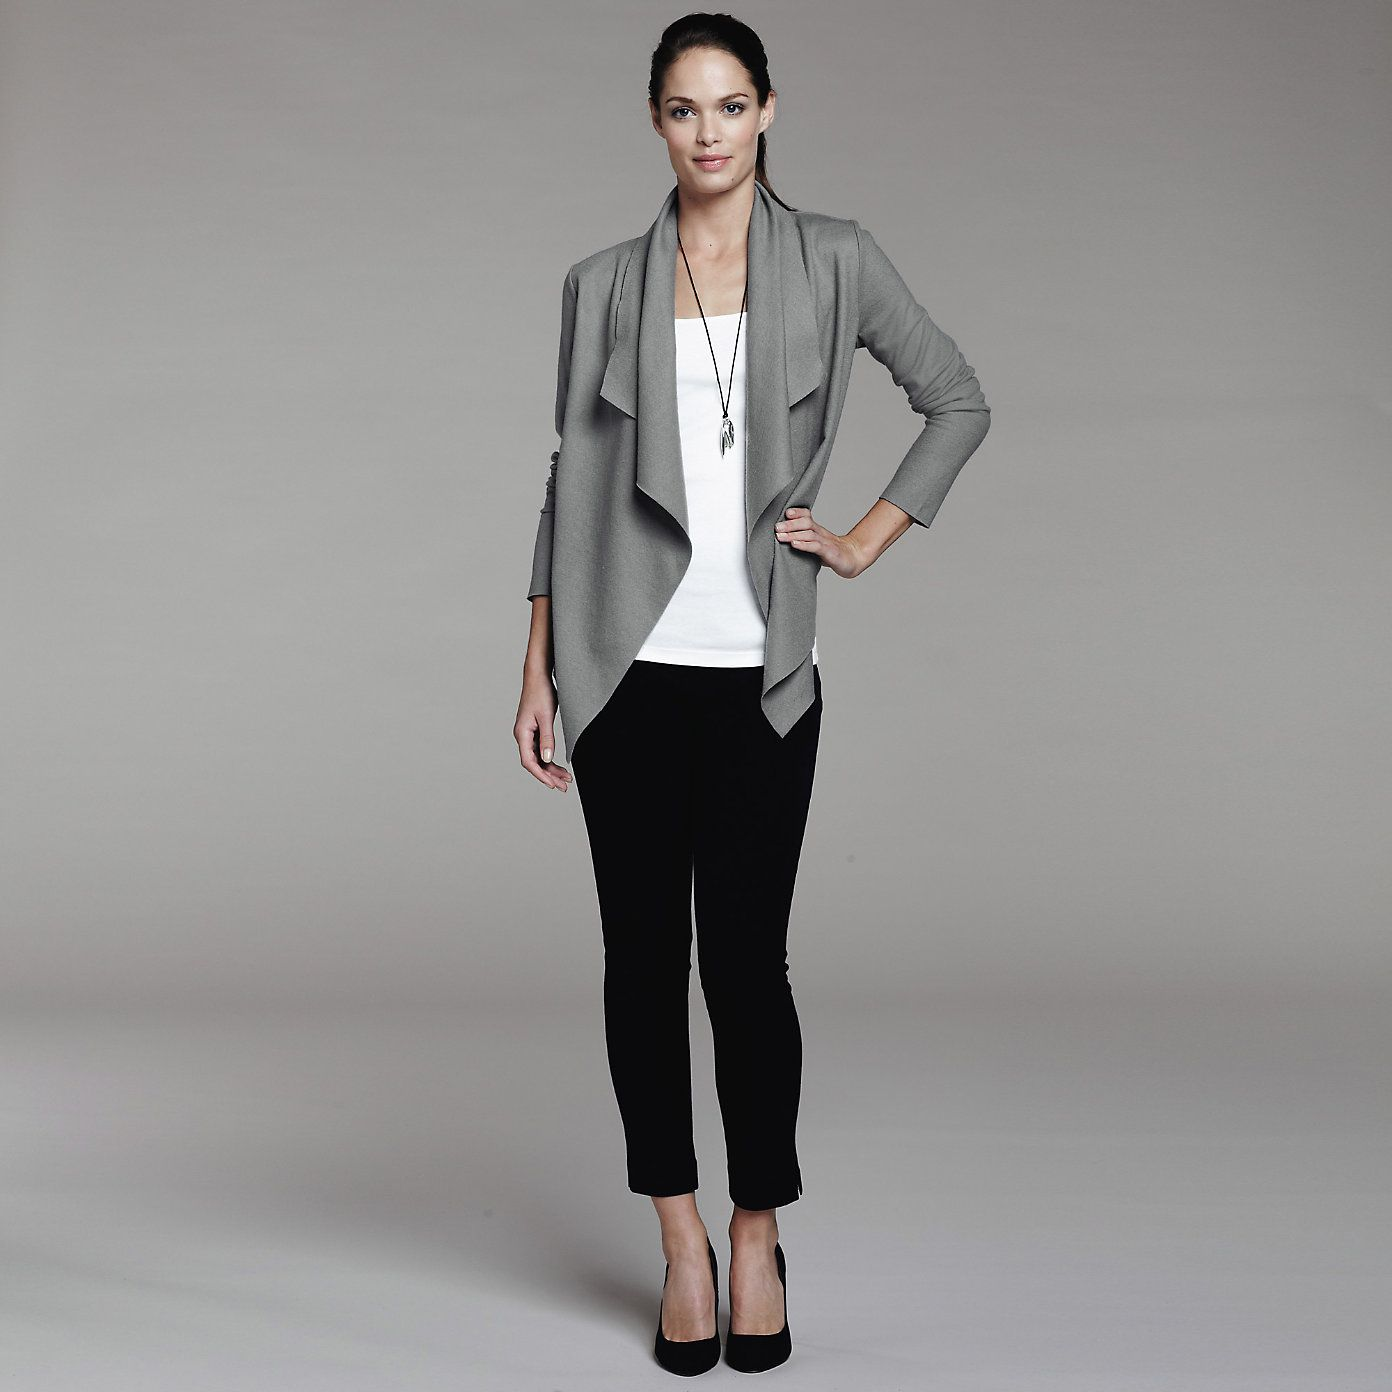 Short Waterfall Wool Cardigan - Frost Grey | Fashioninspiration ...